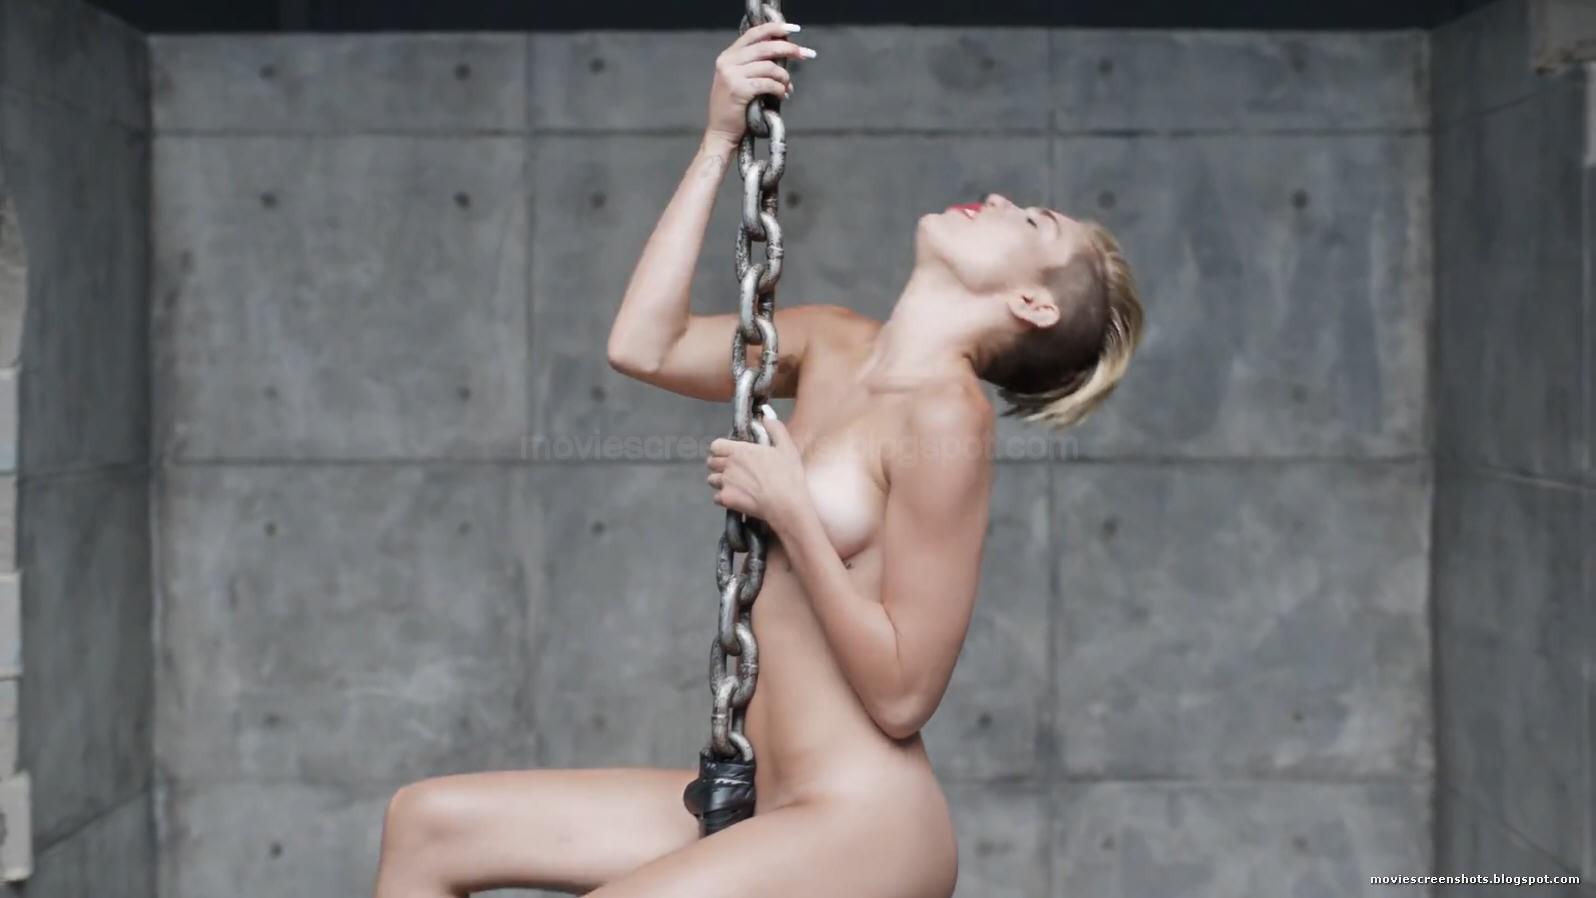 Miley cyrus wrecking ball explicit